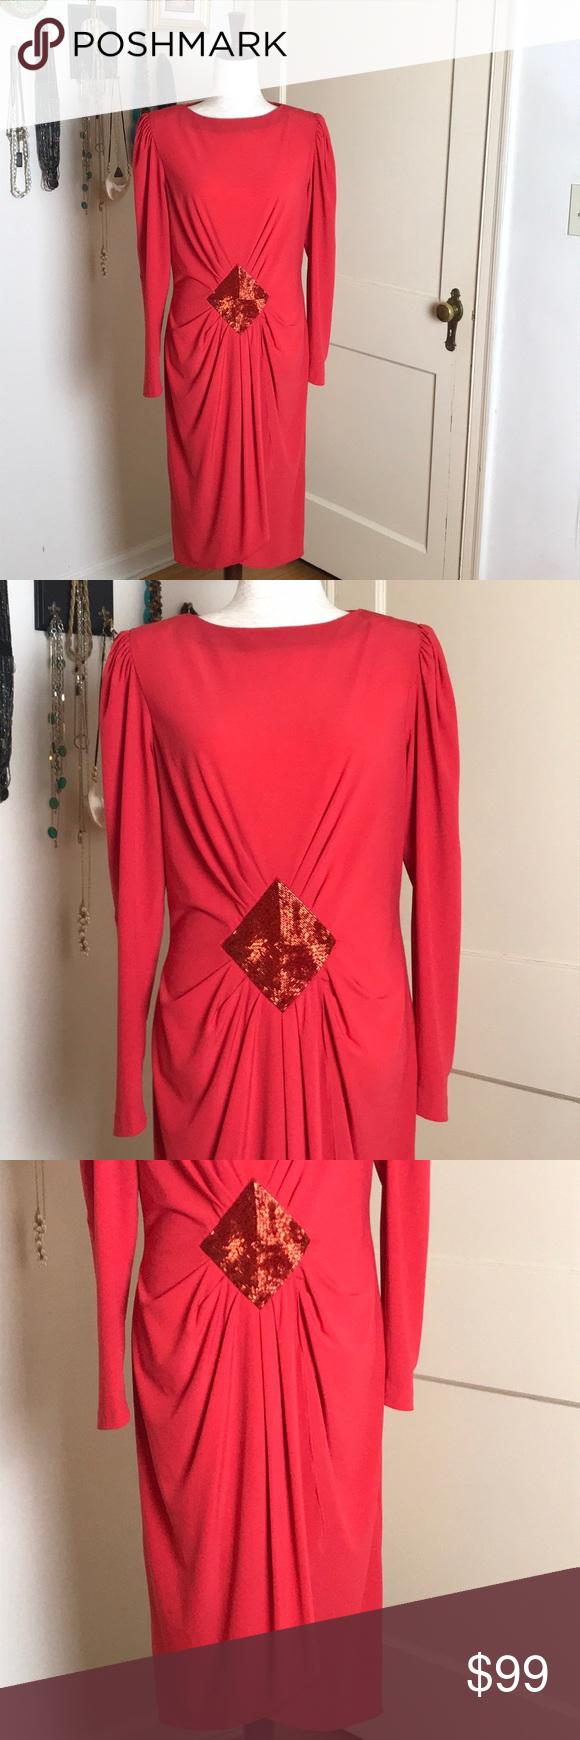 Vintage 70s Beaded Disco Party Dress Rimini Skirt Fashion Party Dress Dresses [ 1740 x 580 Pixel ]